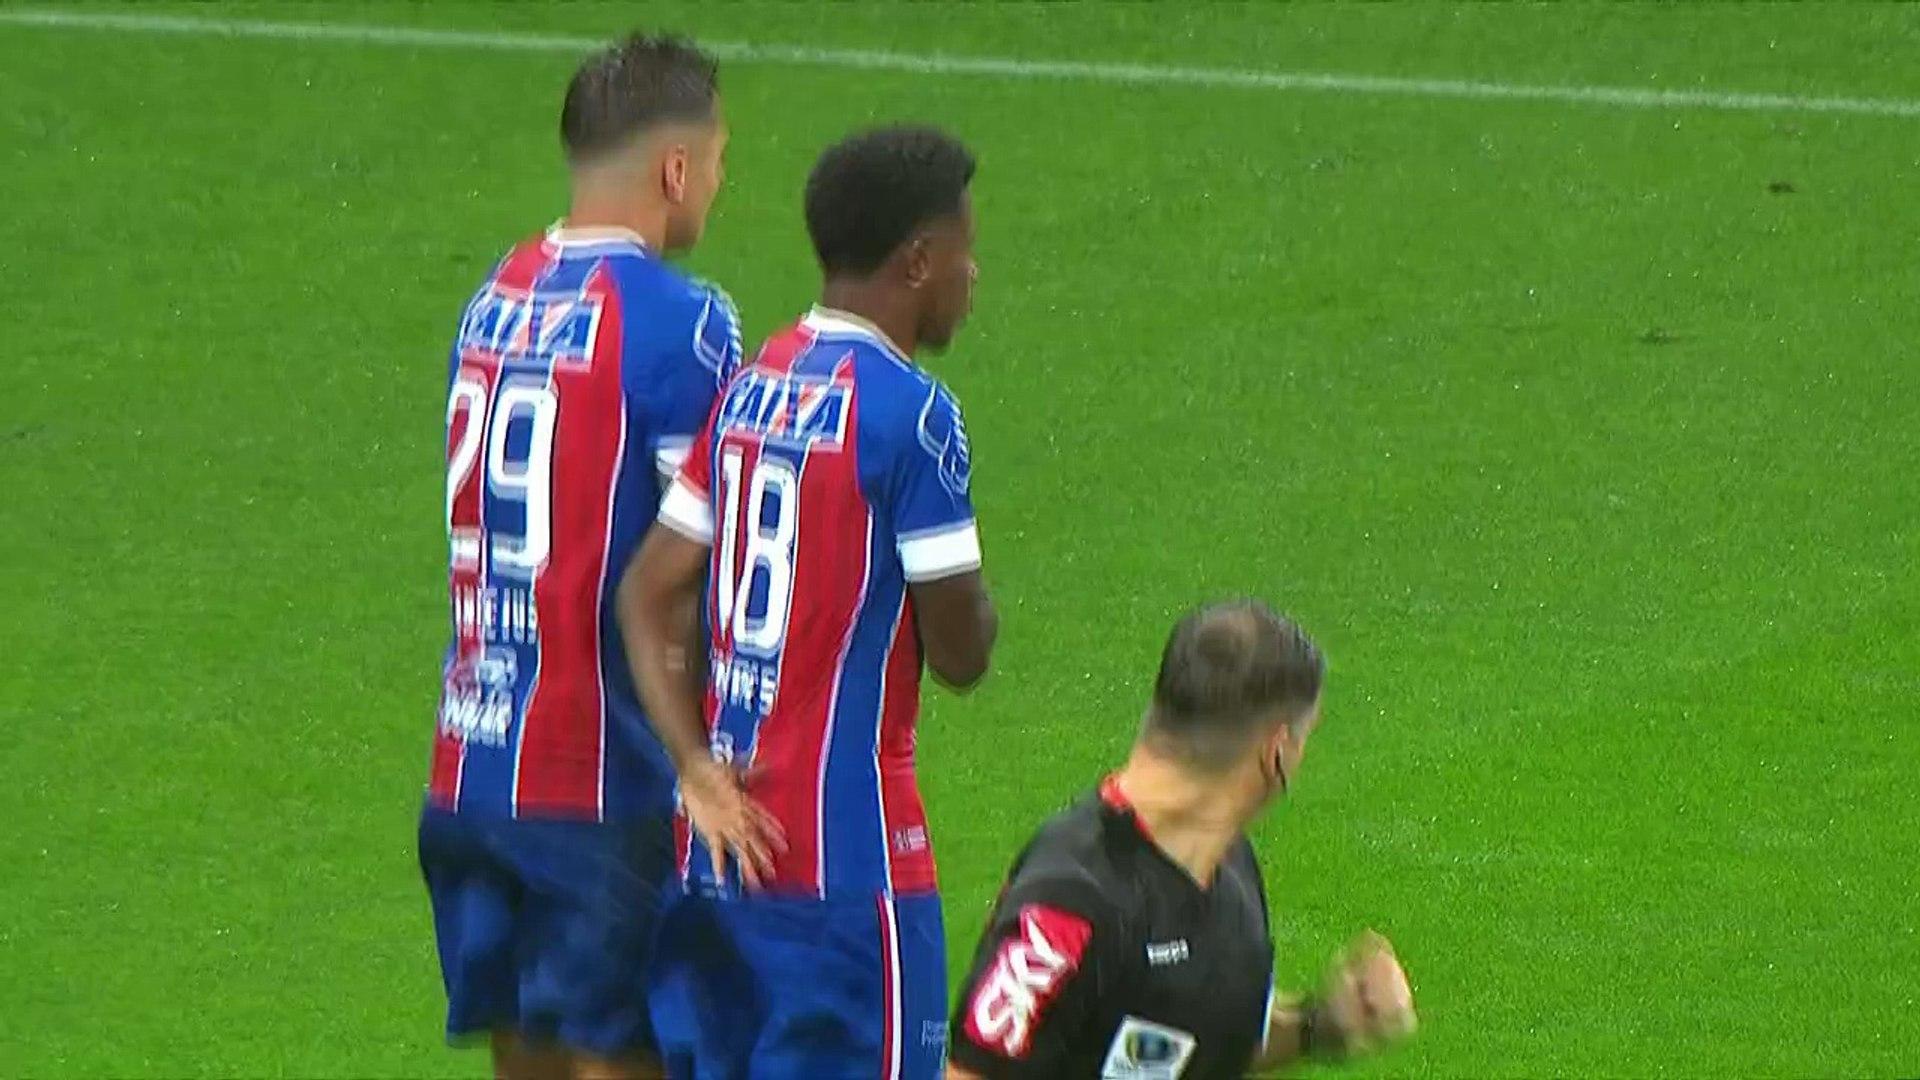 [GOL DE DANILO] Corinthians 2 x 1 Bahia - Série A 2018